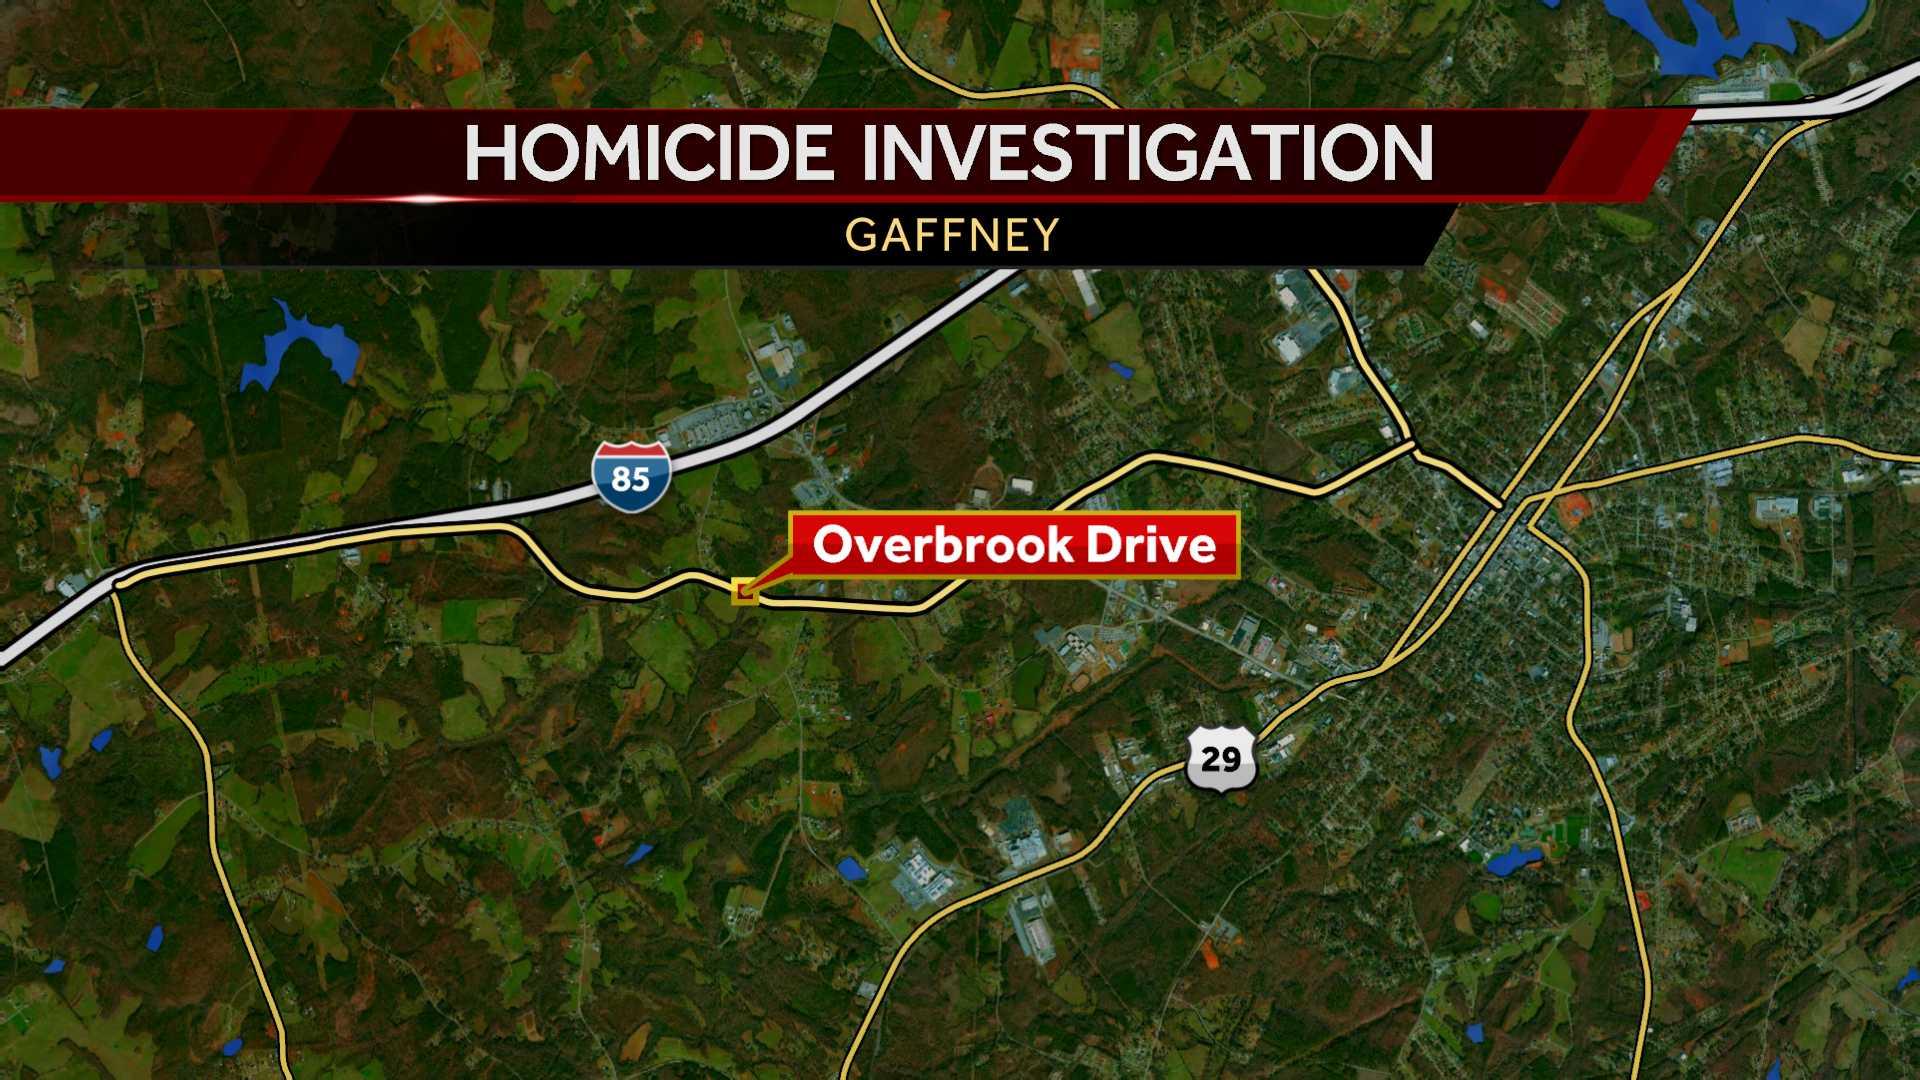 Gaffney homicide